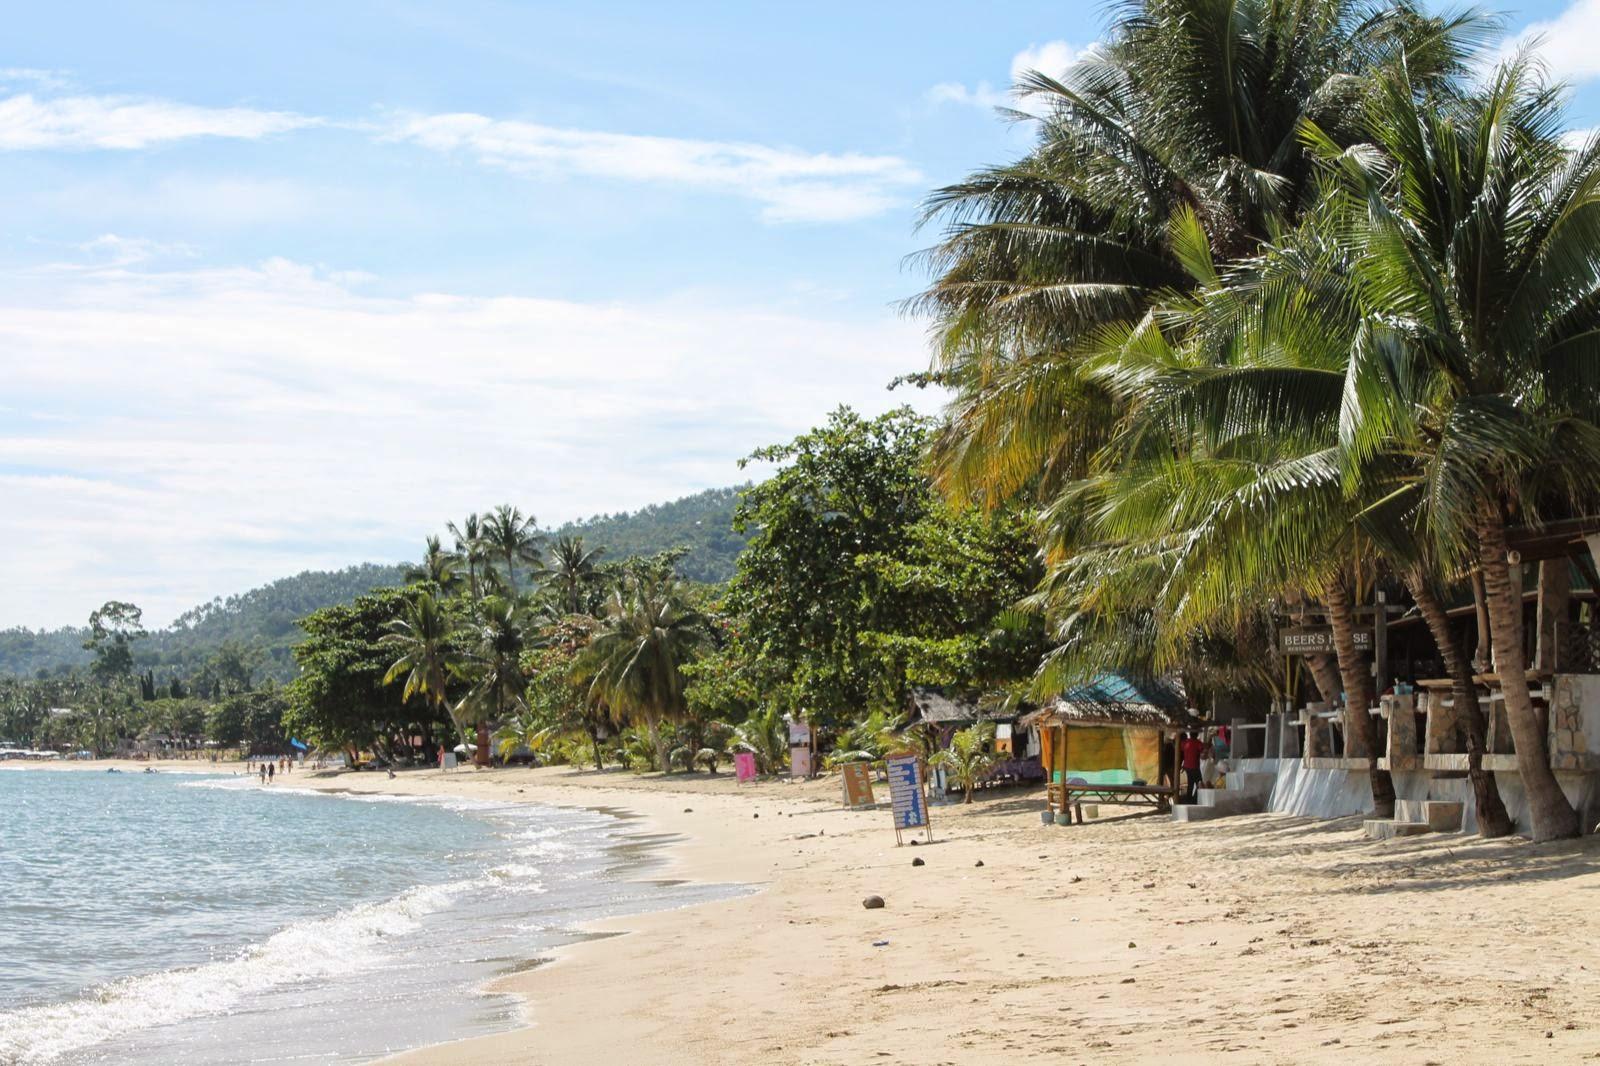 Massage-Hütte Lamai Beach Koh Samui » Entdeckerreisen